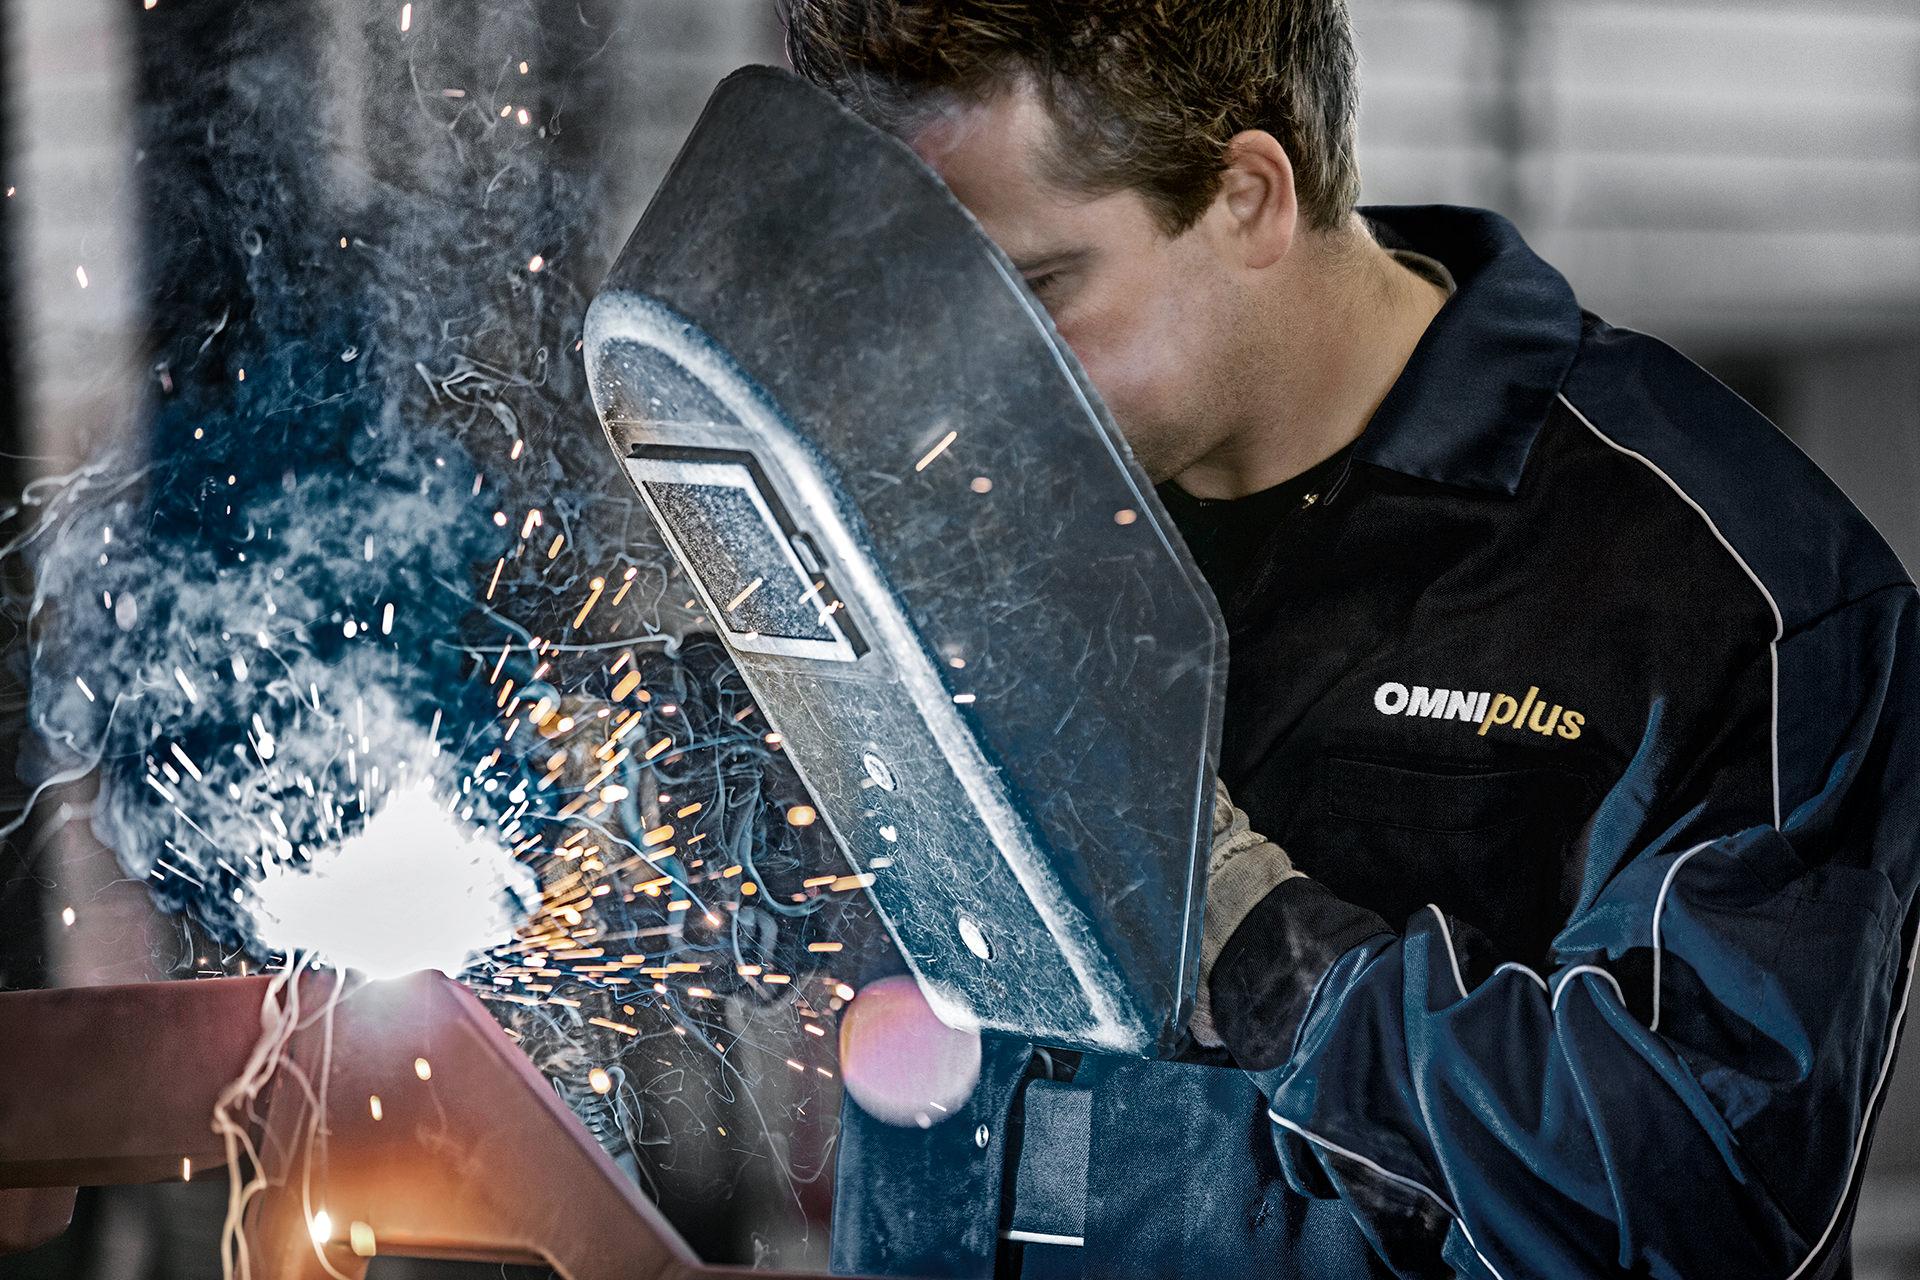 schweissen-arbeitssituation-corporate